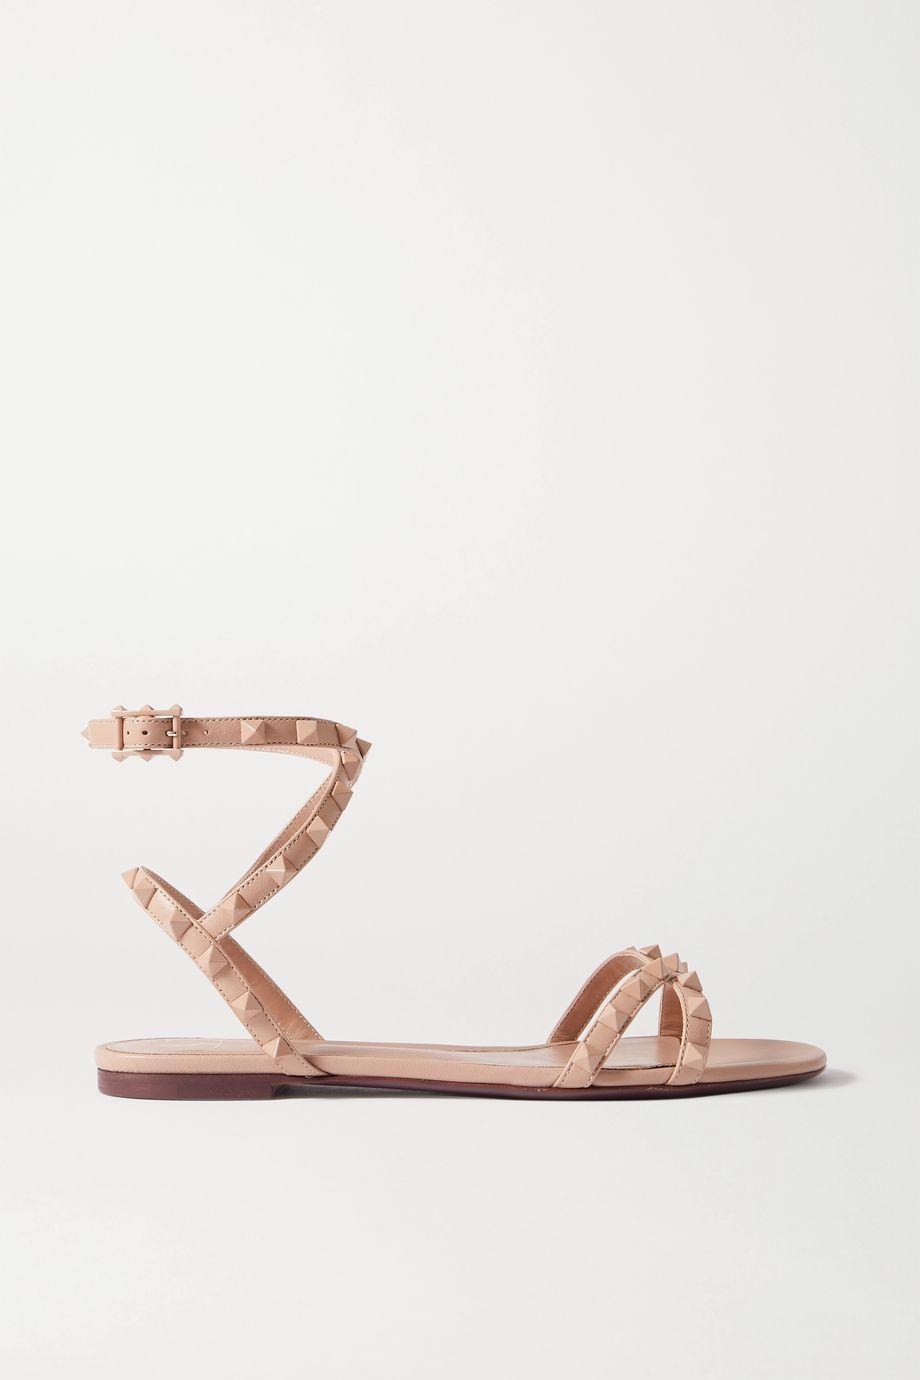 Valentino Valentino Garavani Rockstud Flair leather sandals